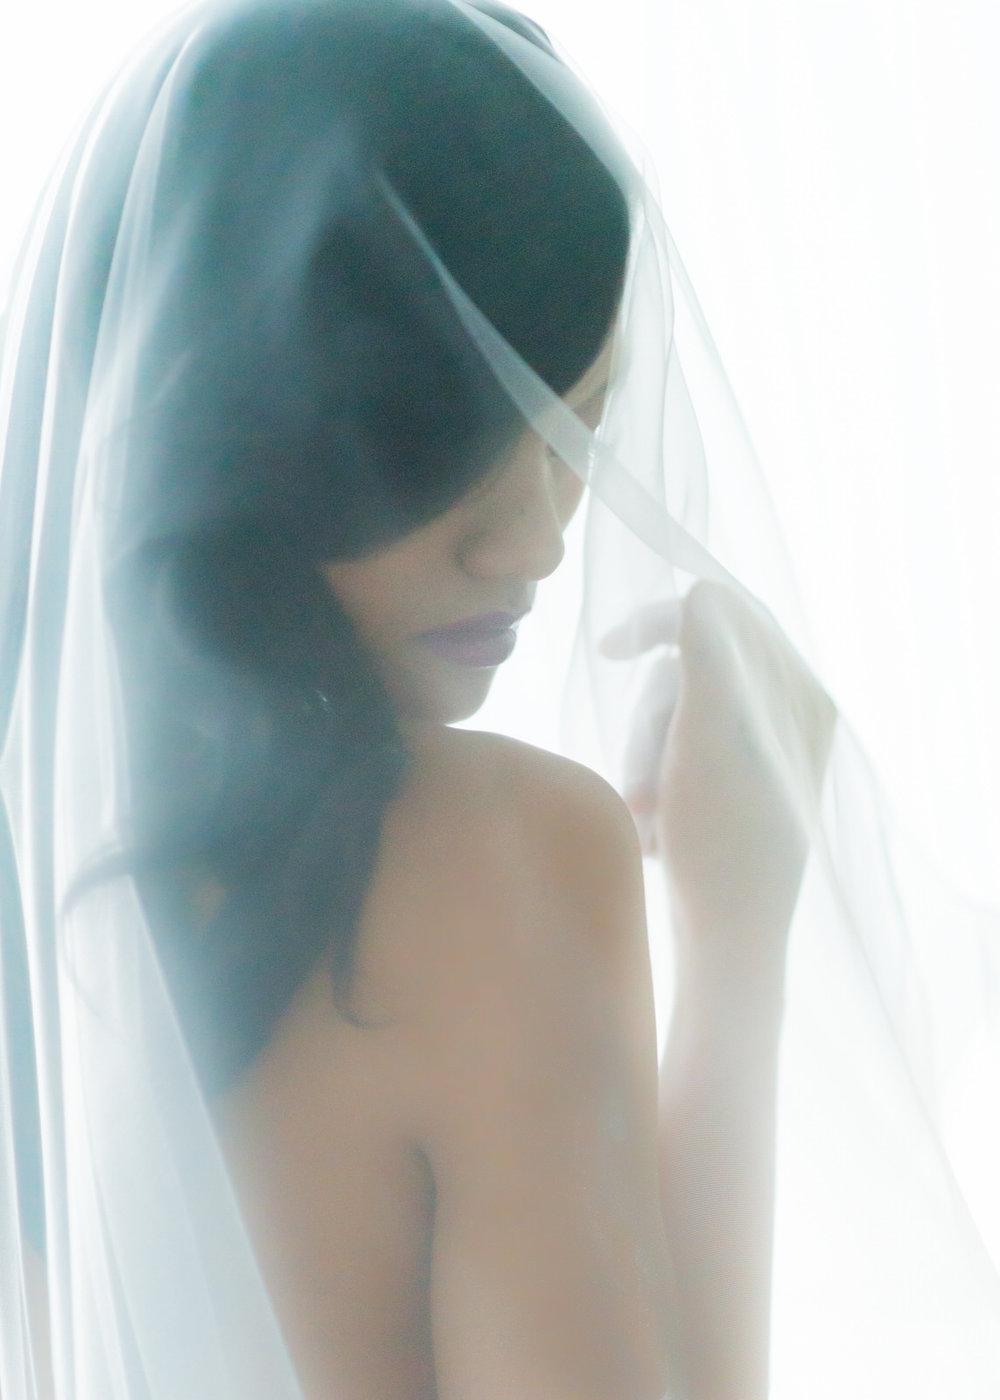 Bridal Boudoir Seattle Bride Veil Elegant Art Sophisticated.jpg